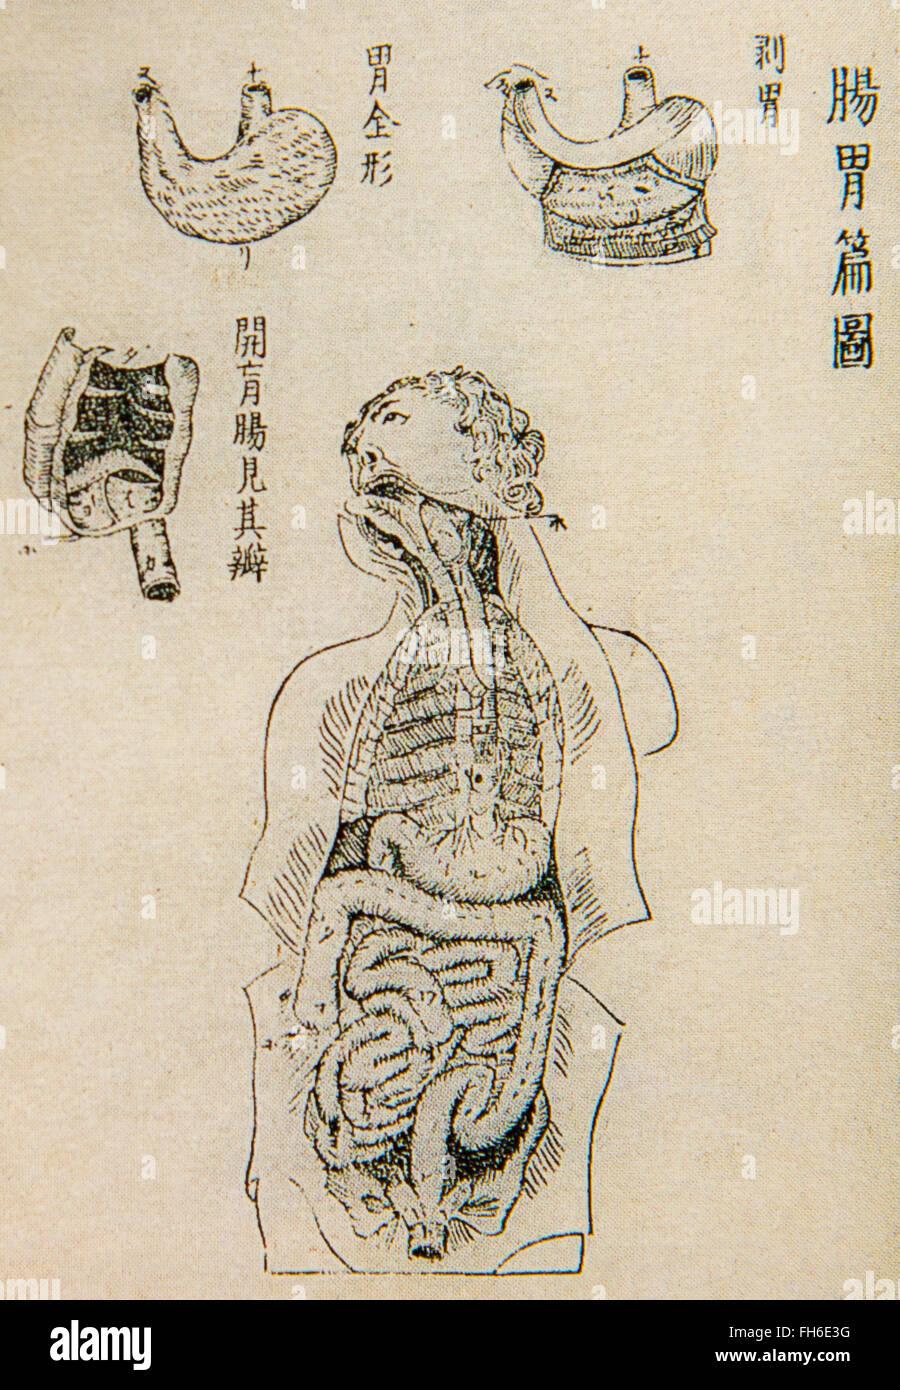 Pagina interna di Kaitaishinsho, traduzione giapponese di anatomia olandese prenota Ontleedkundige Tafelen, dal Immagini Stock